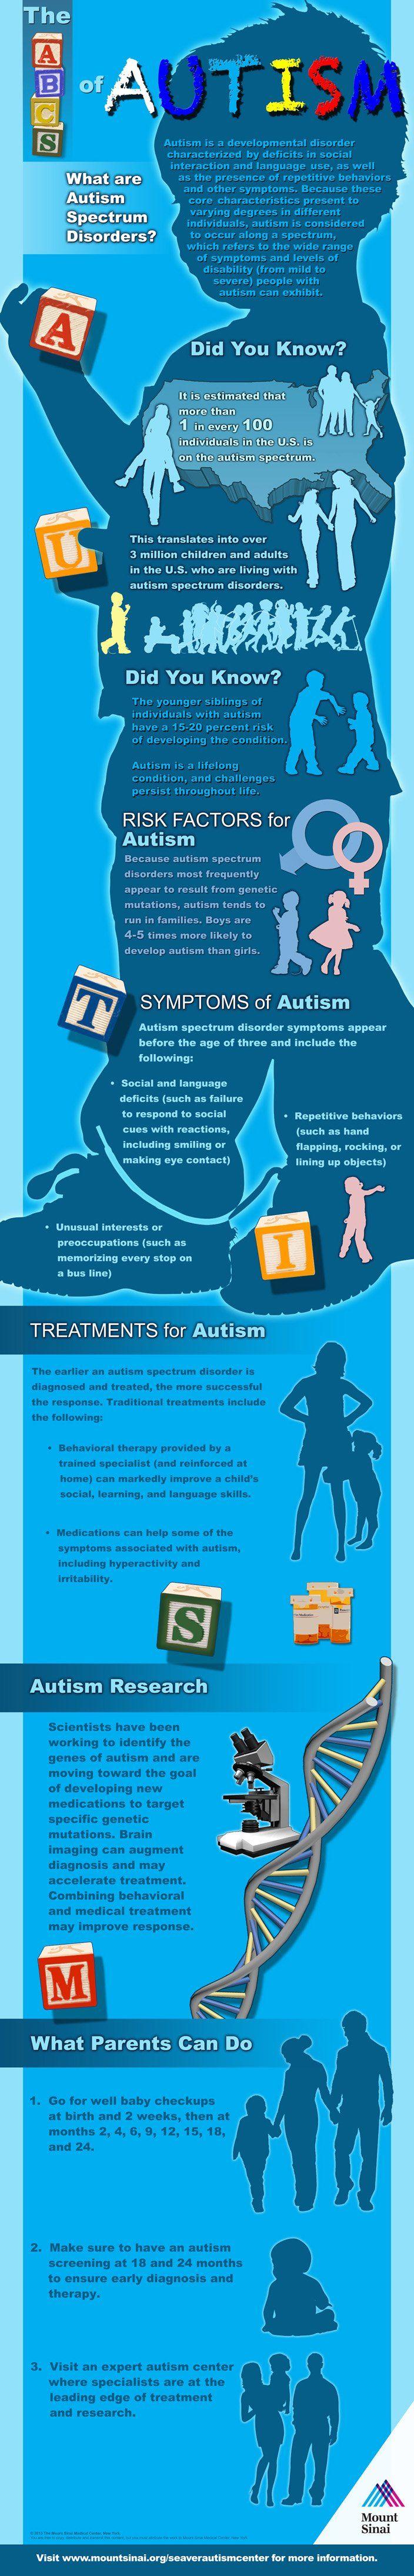 15 best Autism Information images on Pinterest